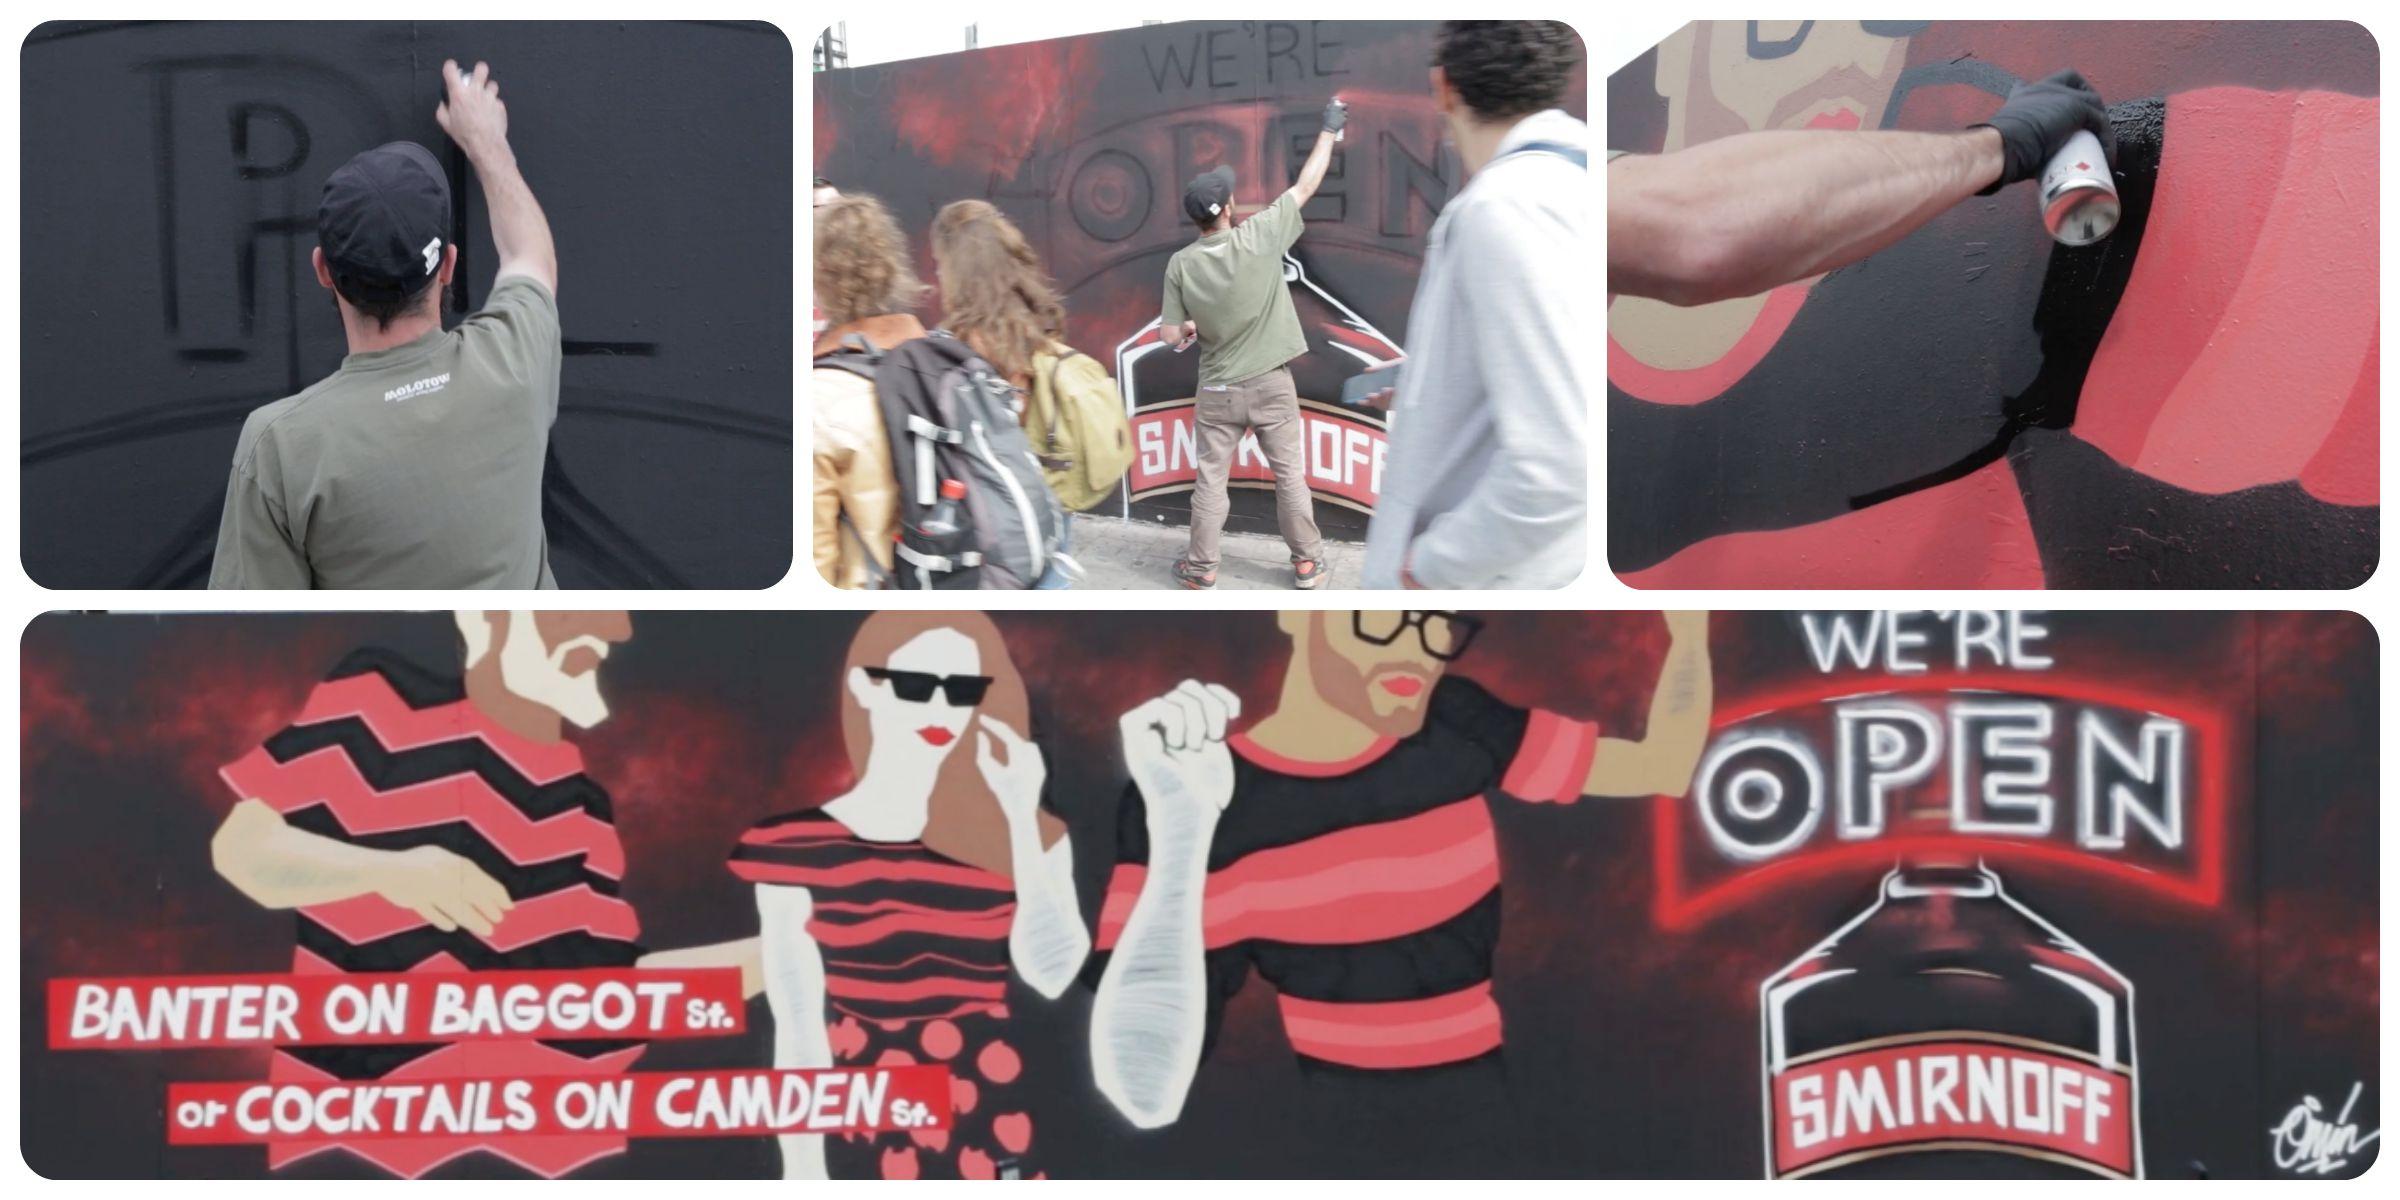 We're Open Collage 1.jpg